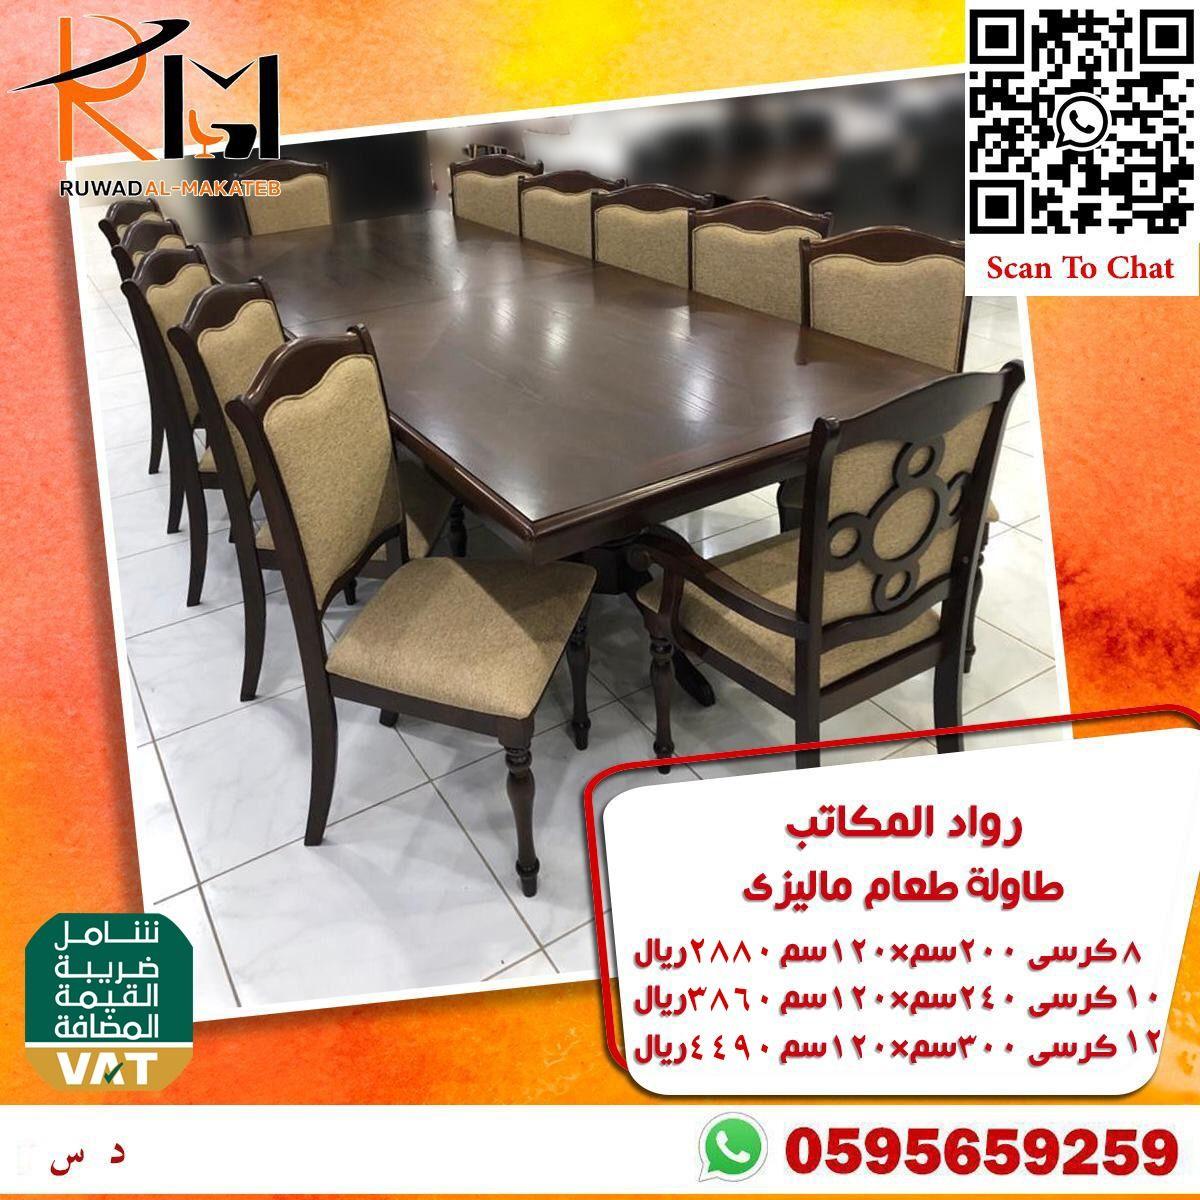 طاولة طعام ماليزي ١٢ كرسي In 2021 Home Decor Furniture Dining Chairs